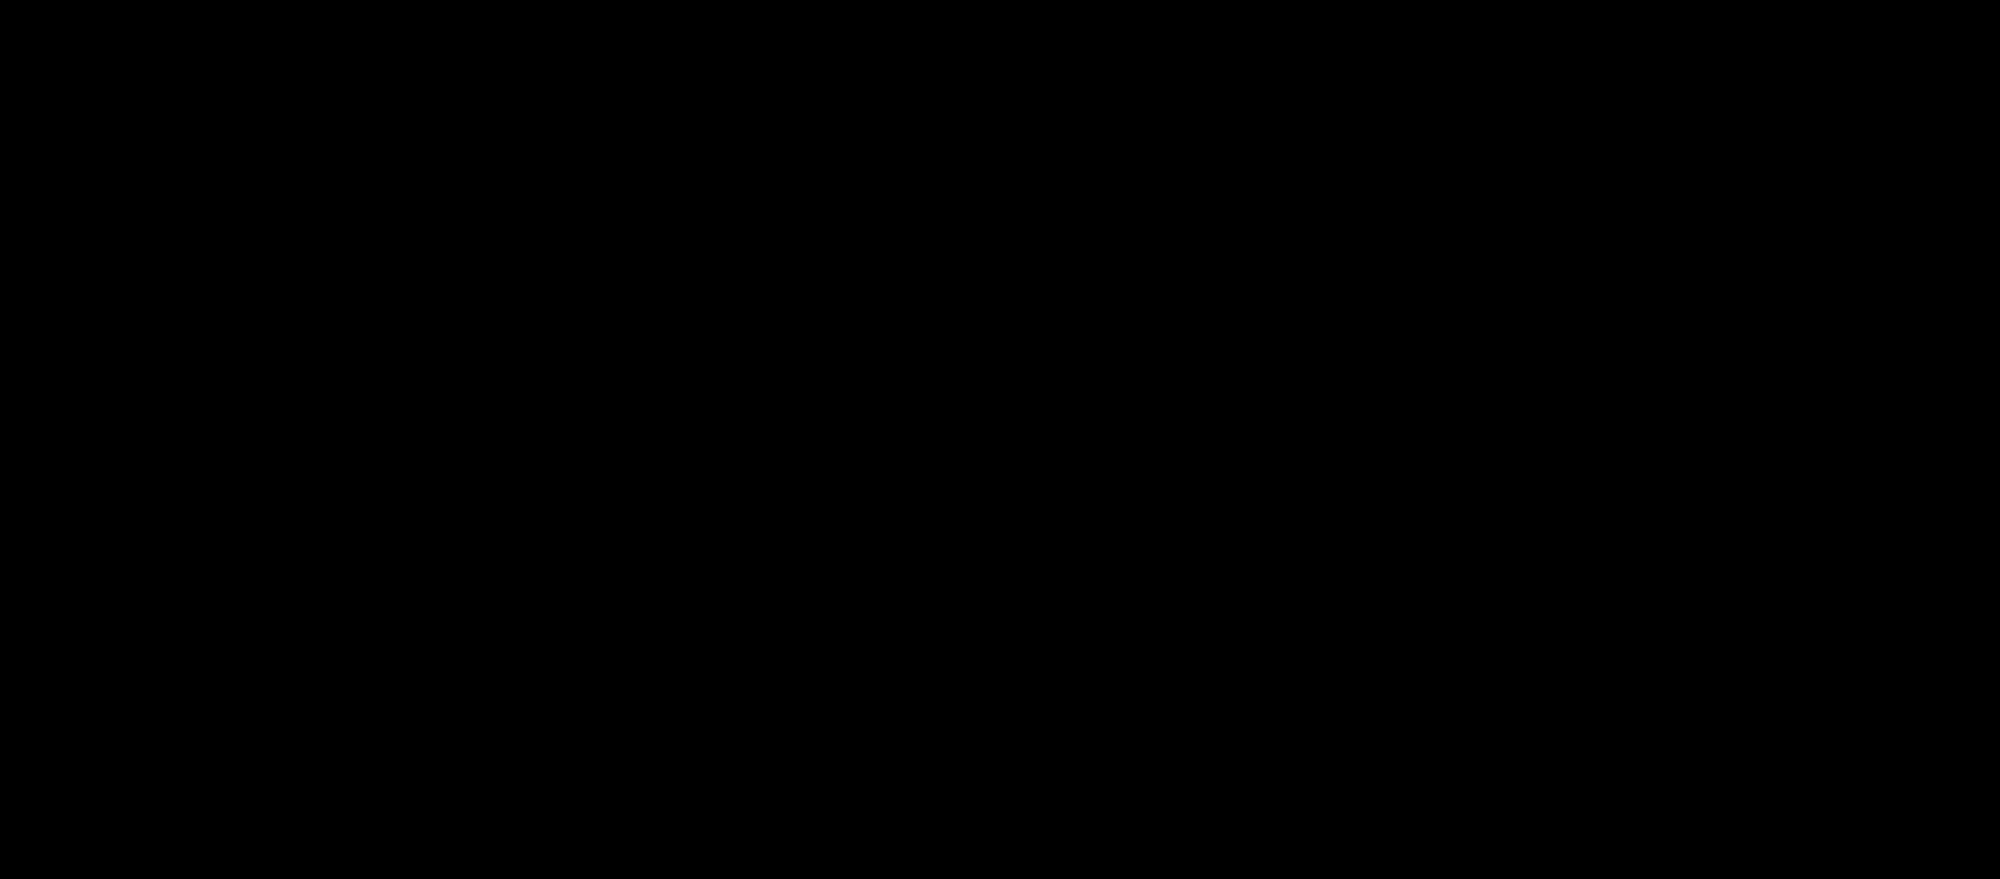 ACTION, ACTION-logo-black.png